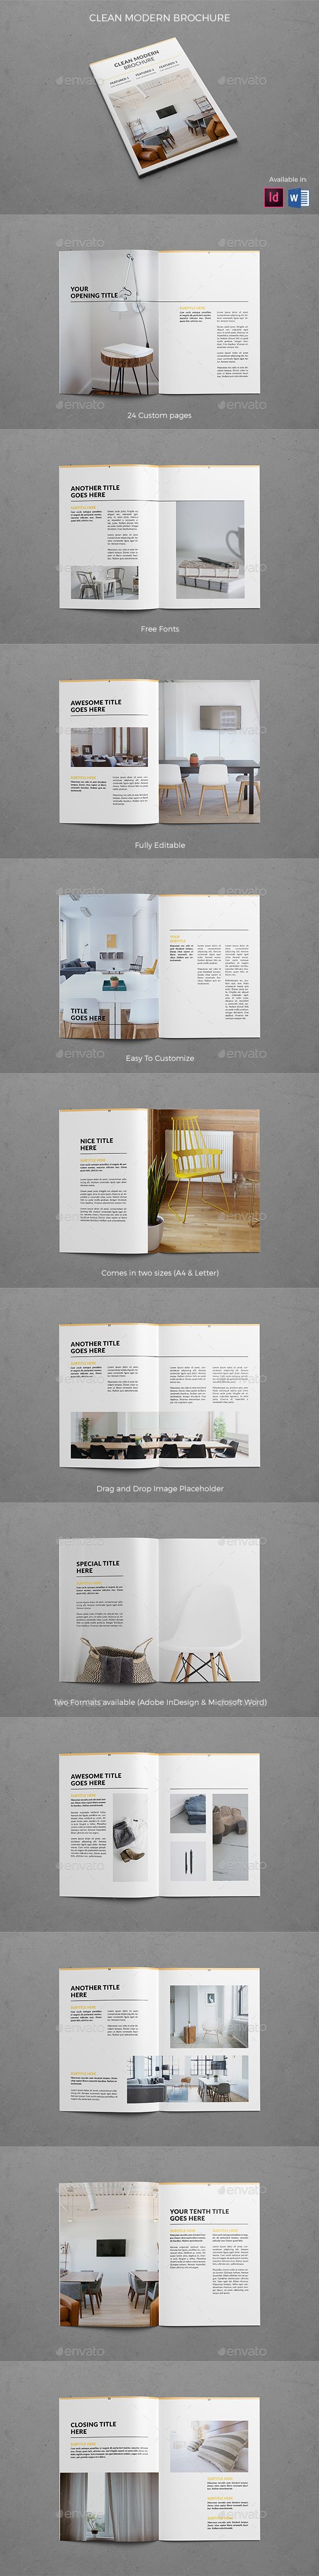 Clean Modern Brochure Template InDesign INDD